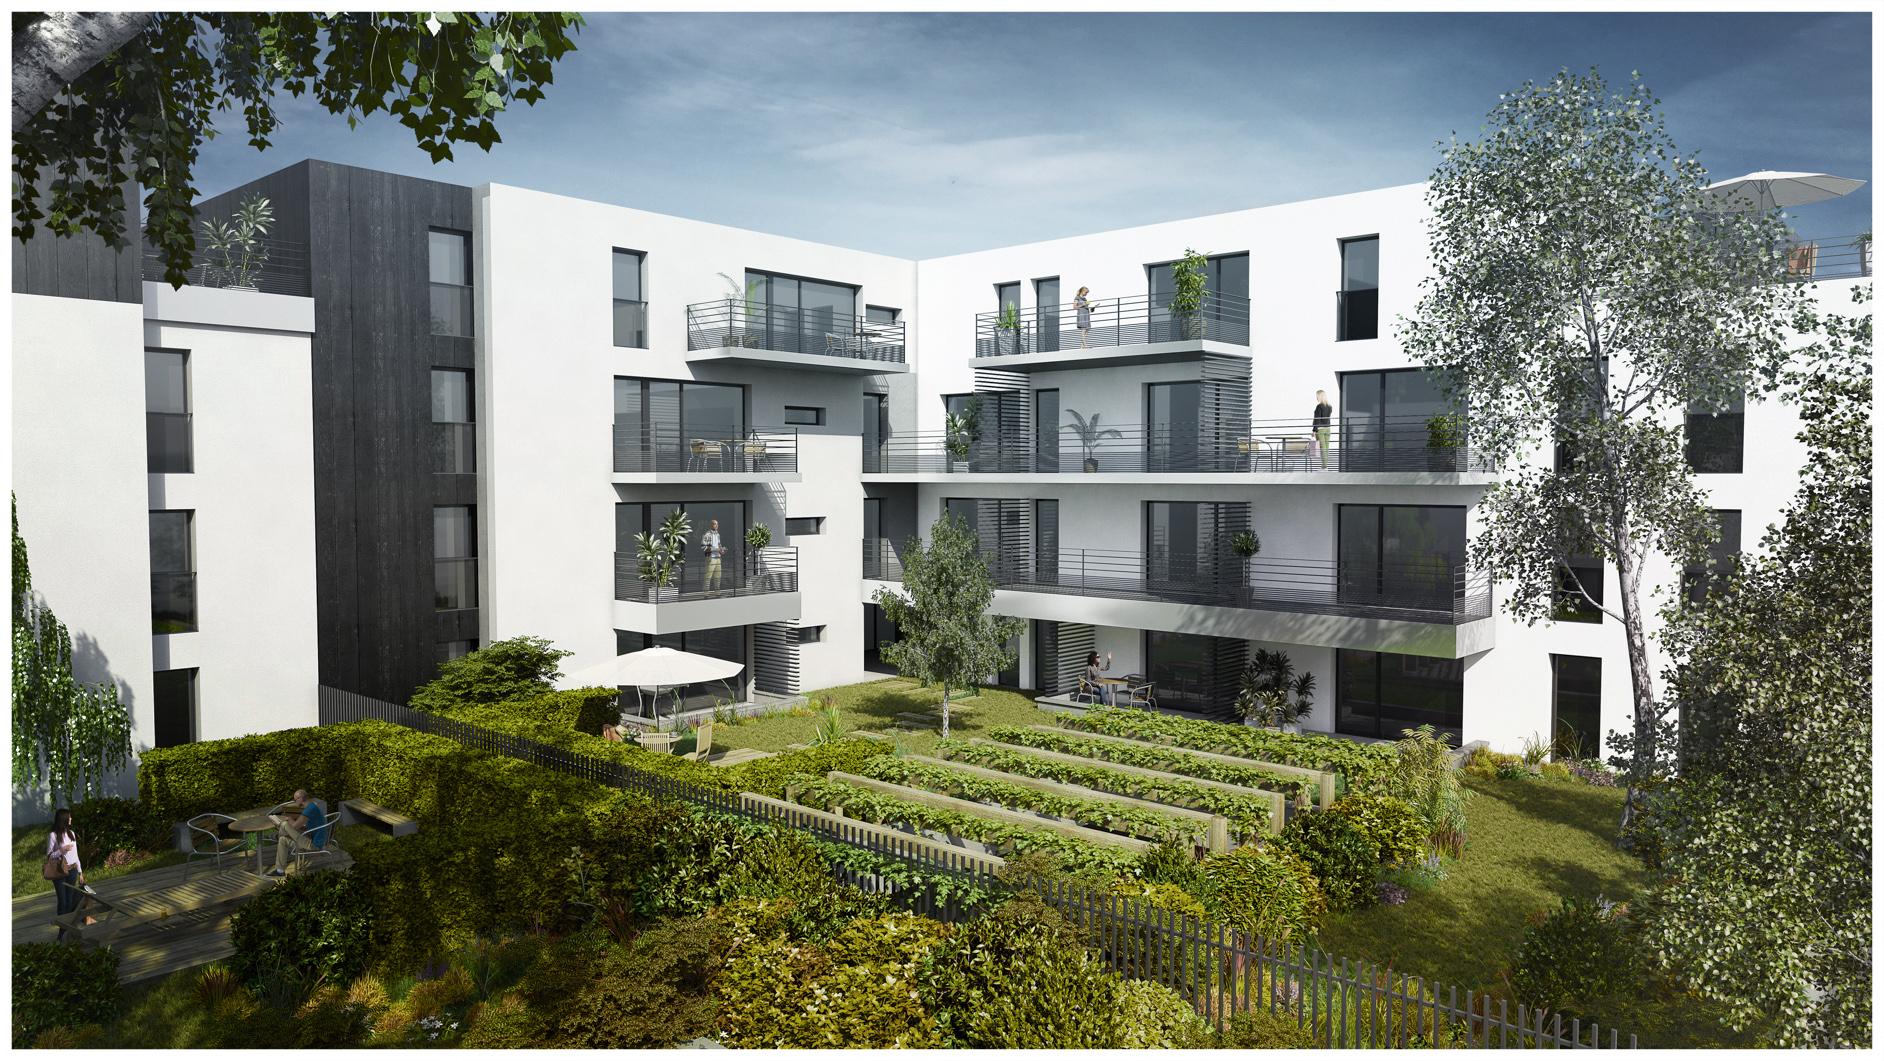 Promotteur Immobilier Groupe Gambetta - Images 3D Dripmoon